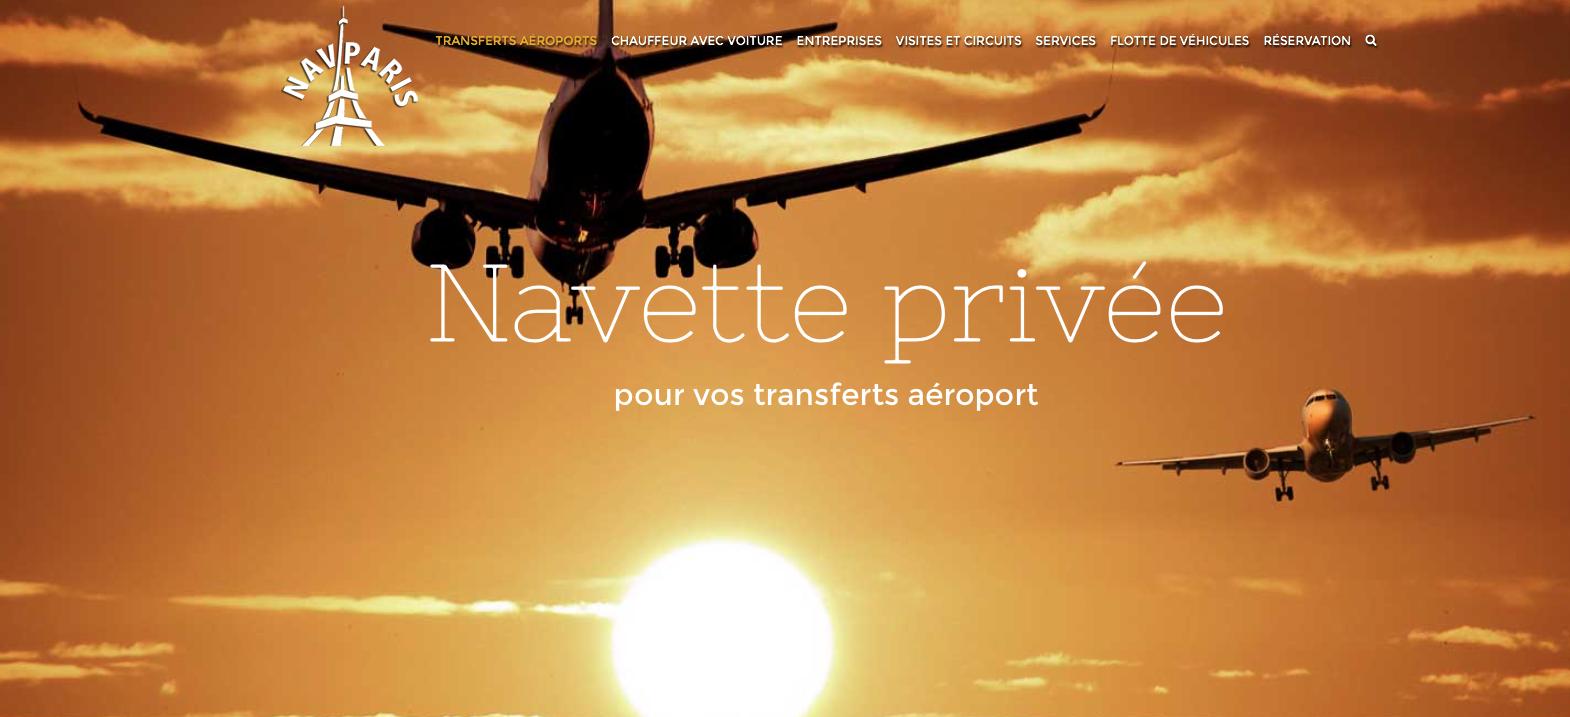 Atenao traduit le site web de Navparis